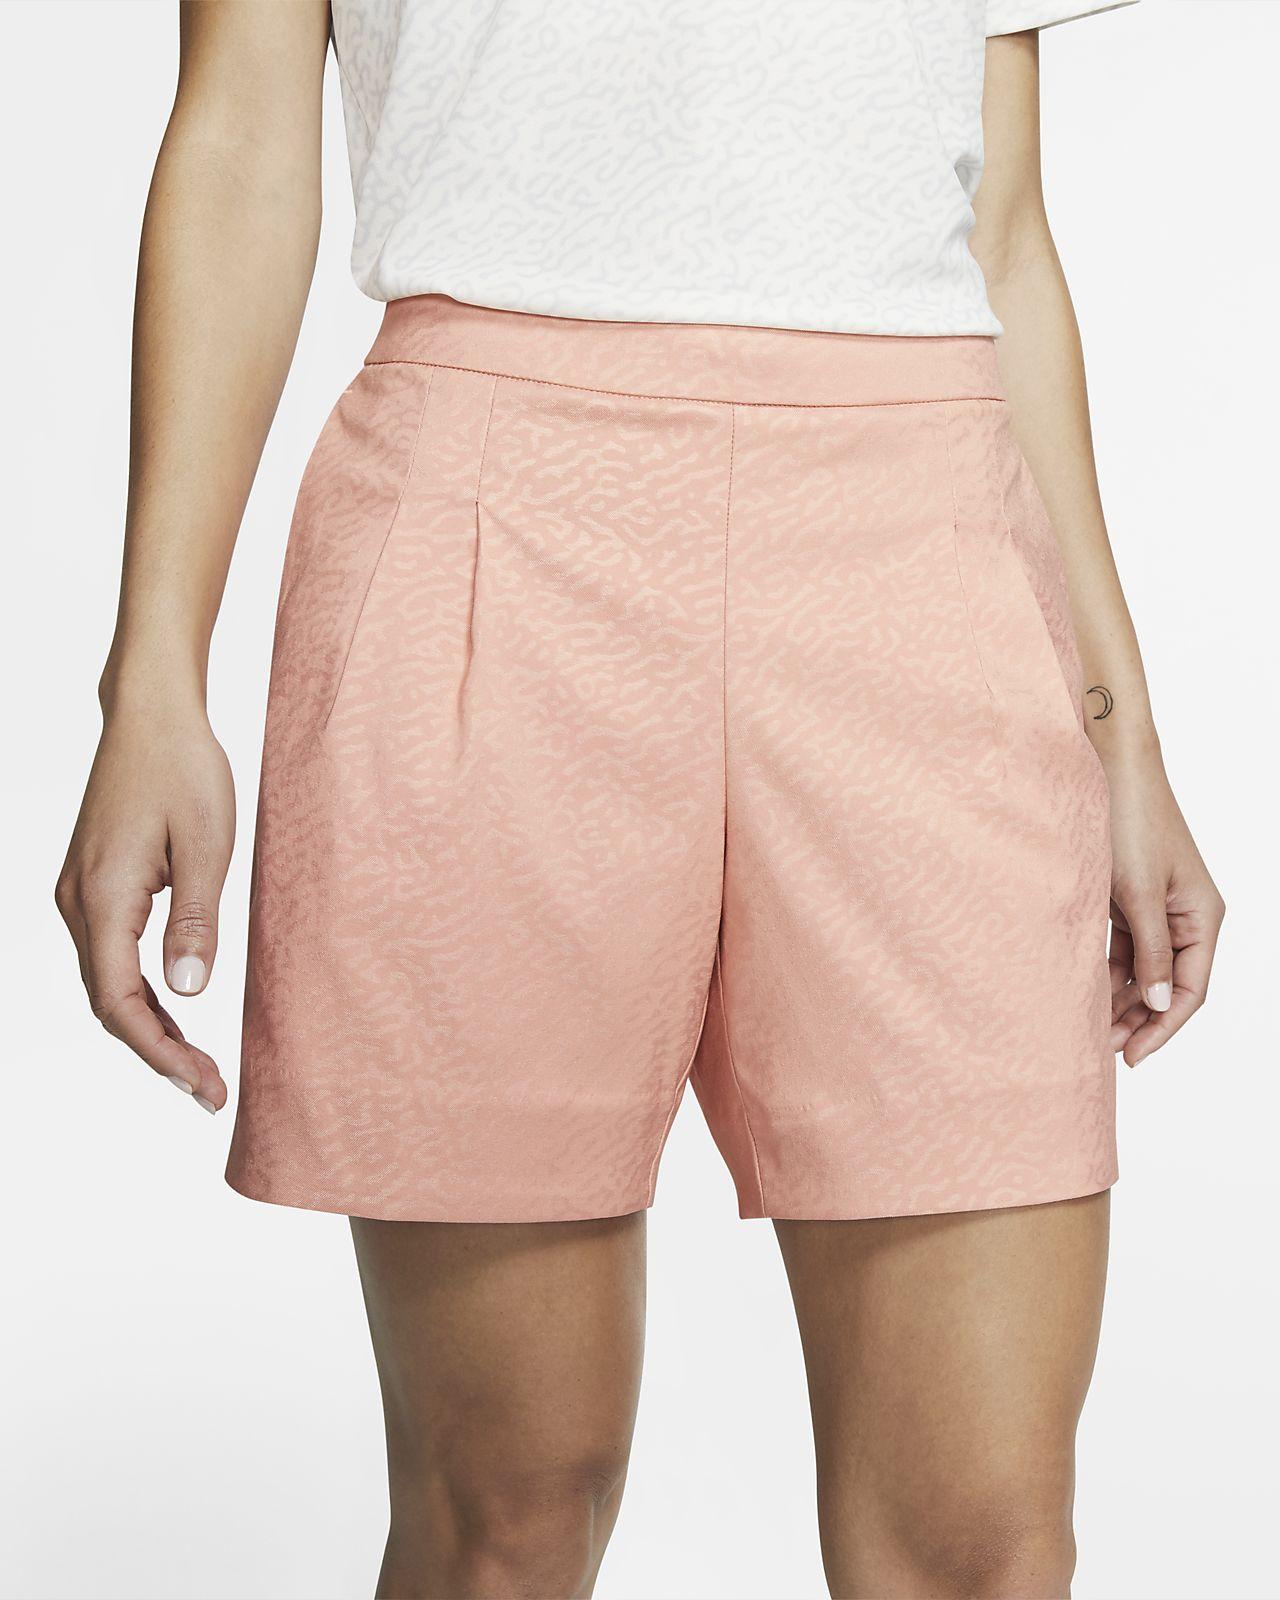 Nike Dri-FIT UV Women's Golf Shorts